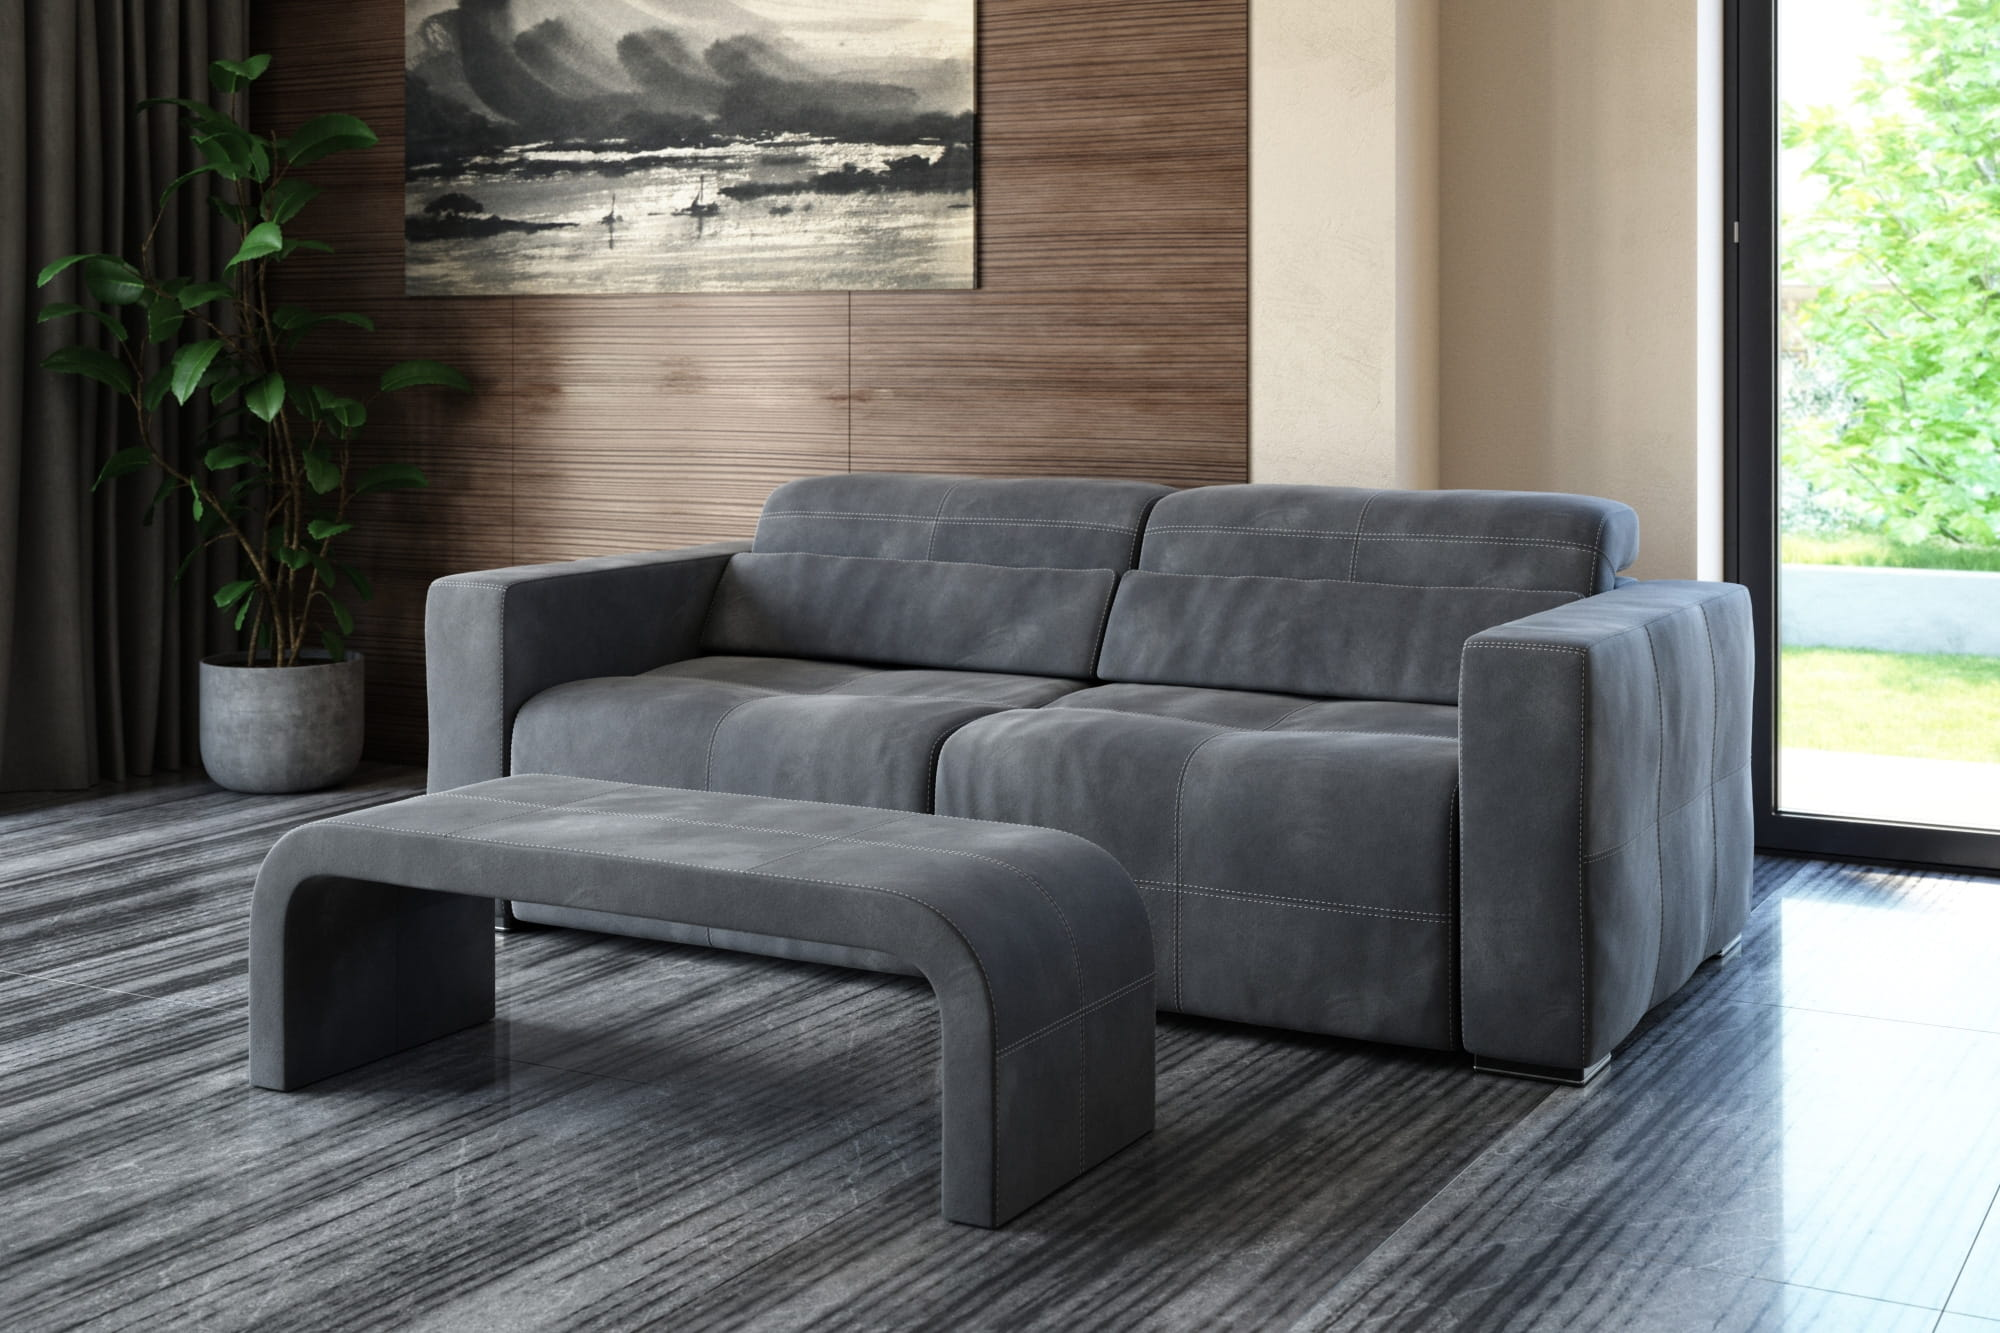 Furniture 7 AM245 Archmodels